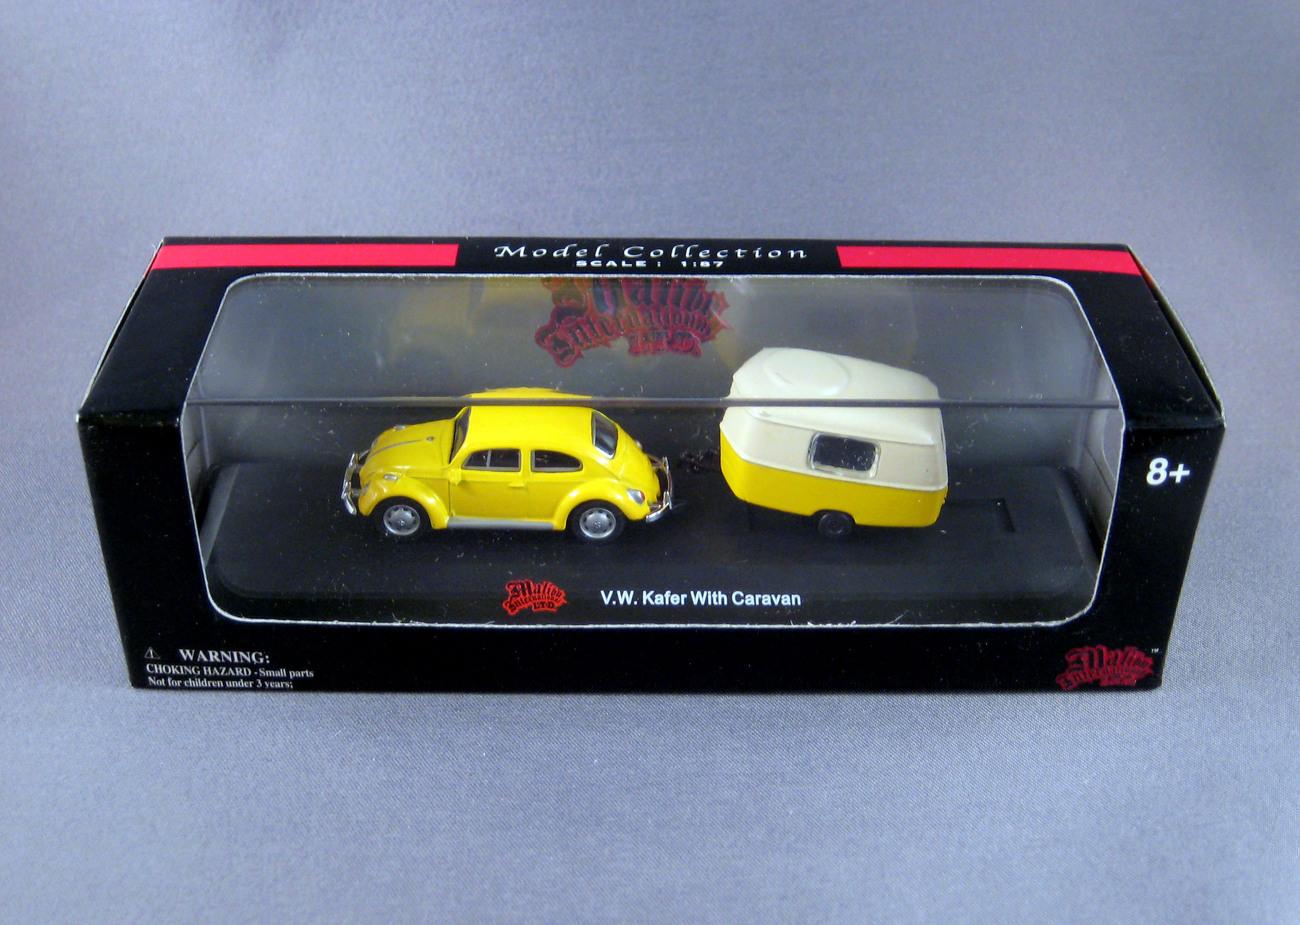 NEW Yellow V.W. Kafer w/